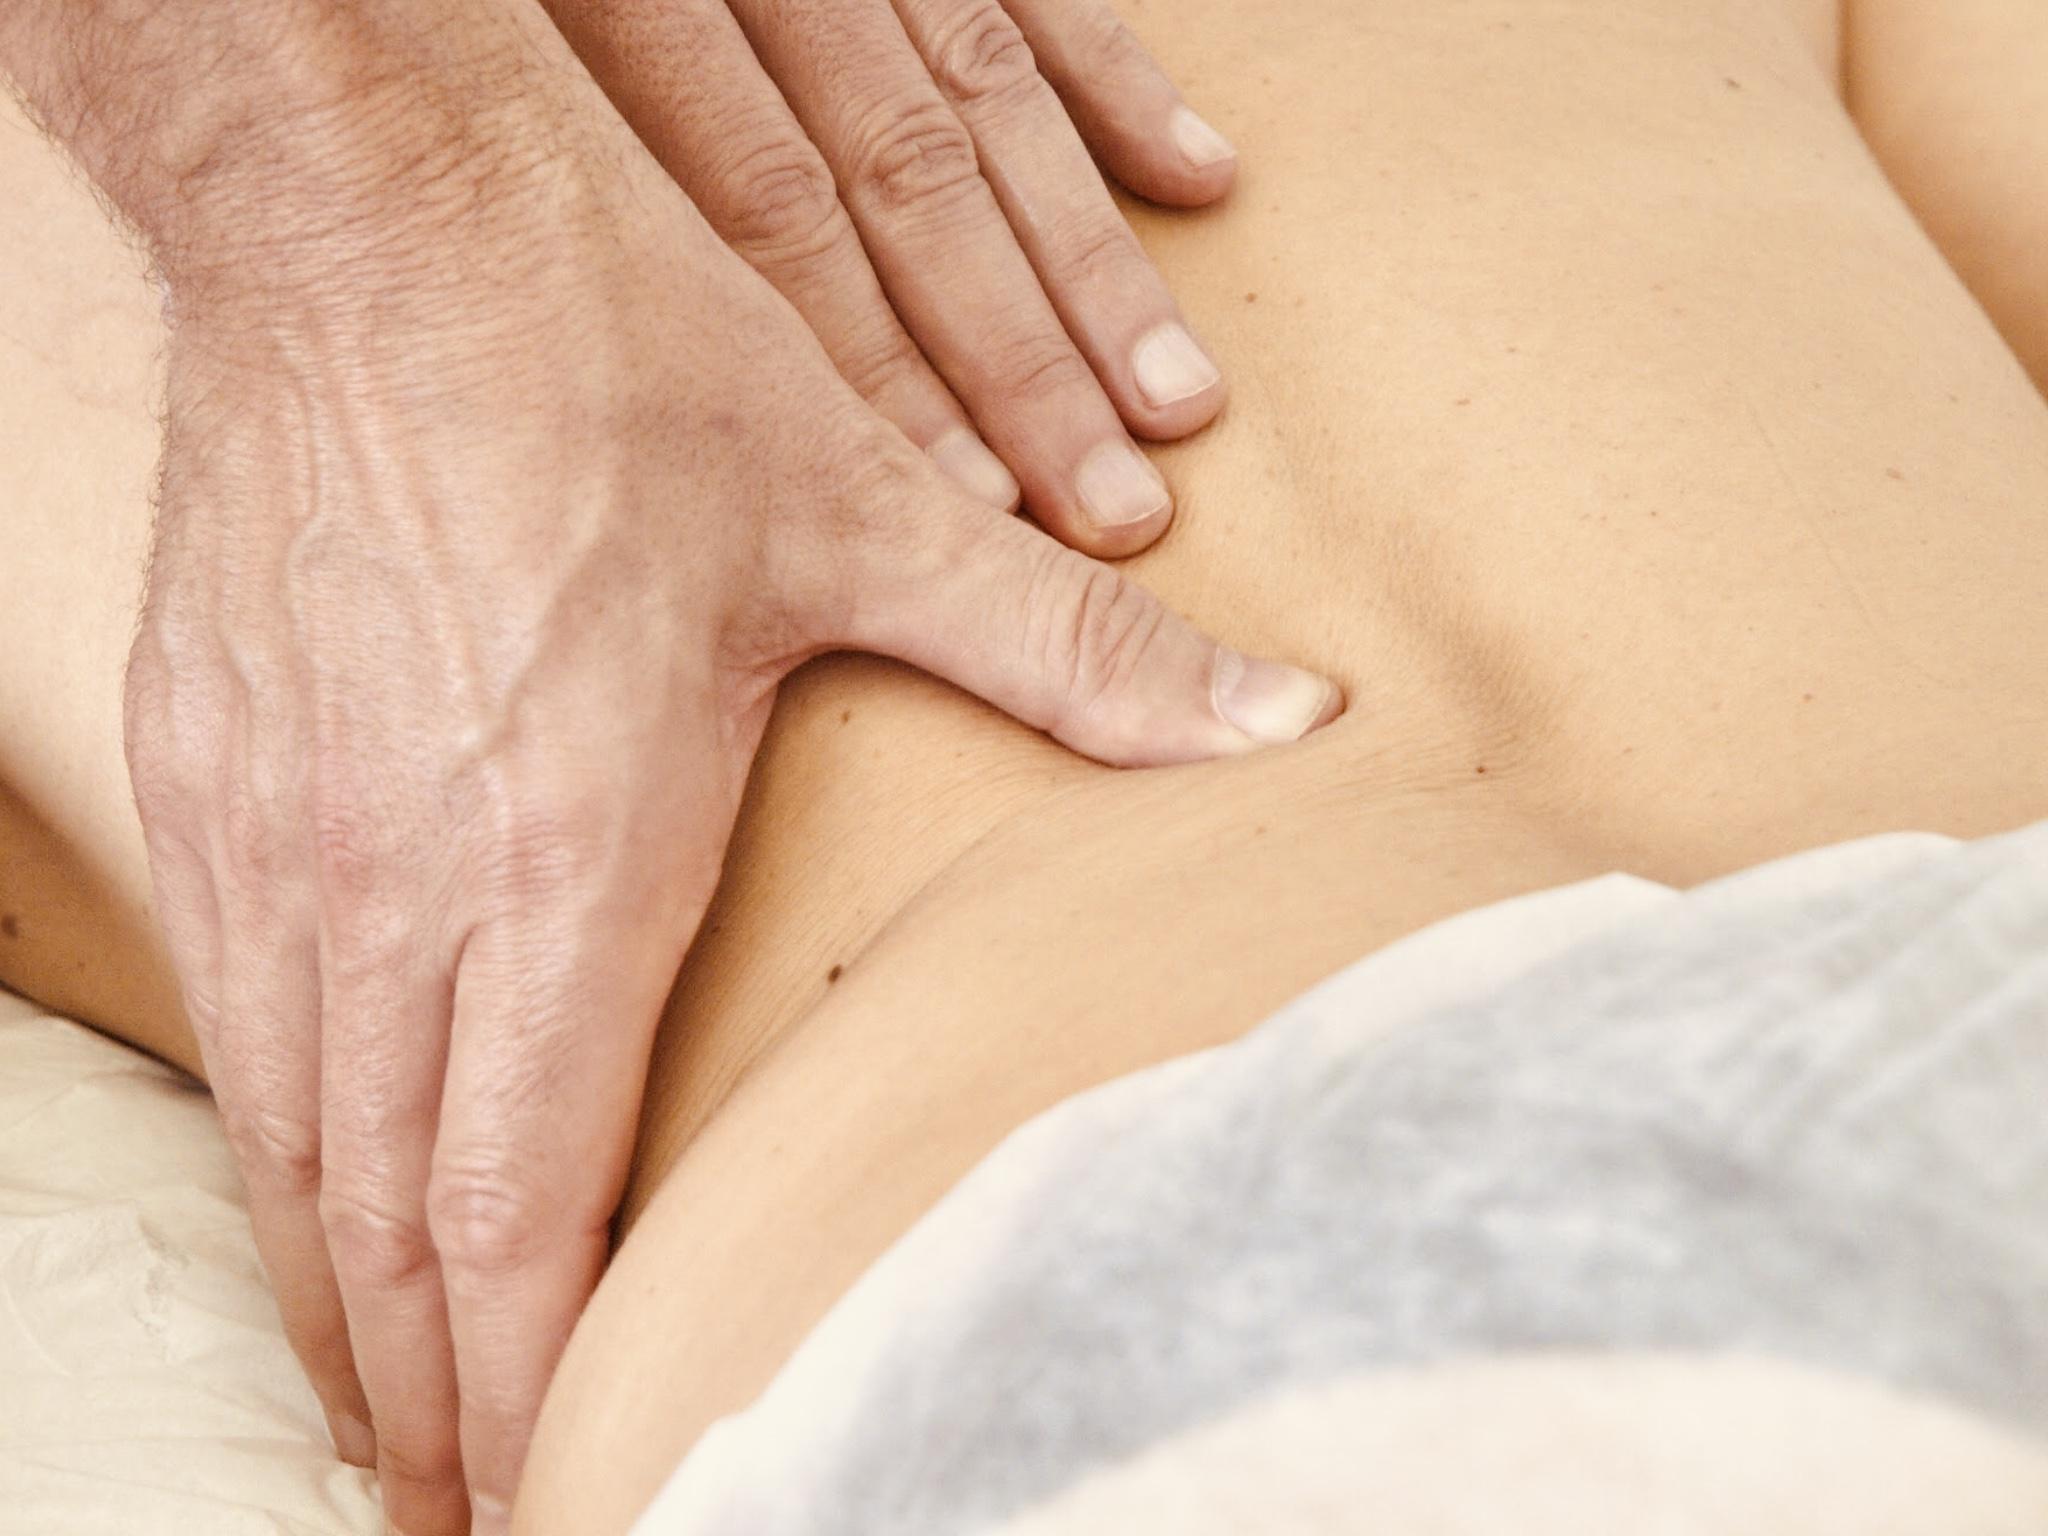 massagem de medicina chinesa Tui Ná